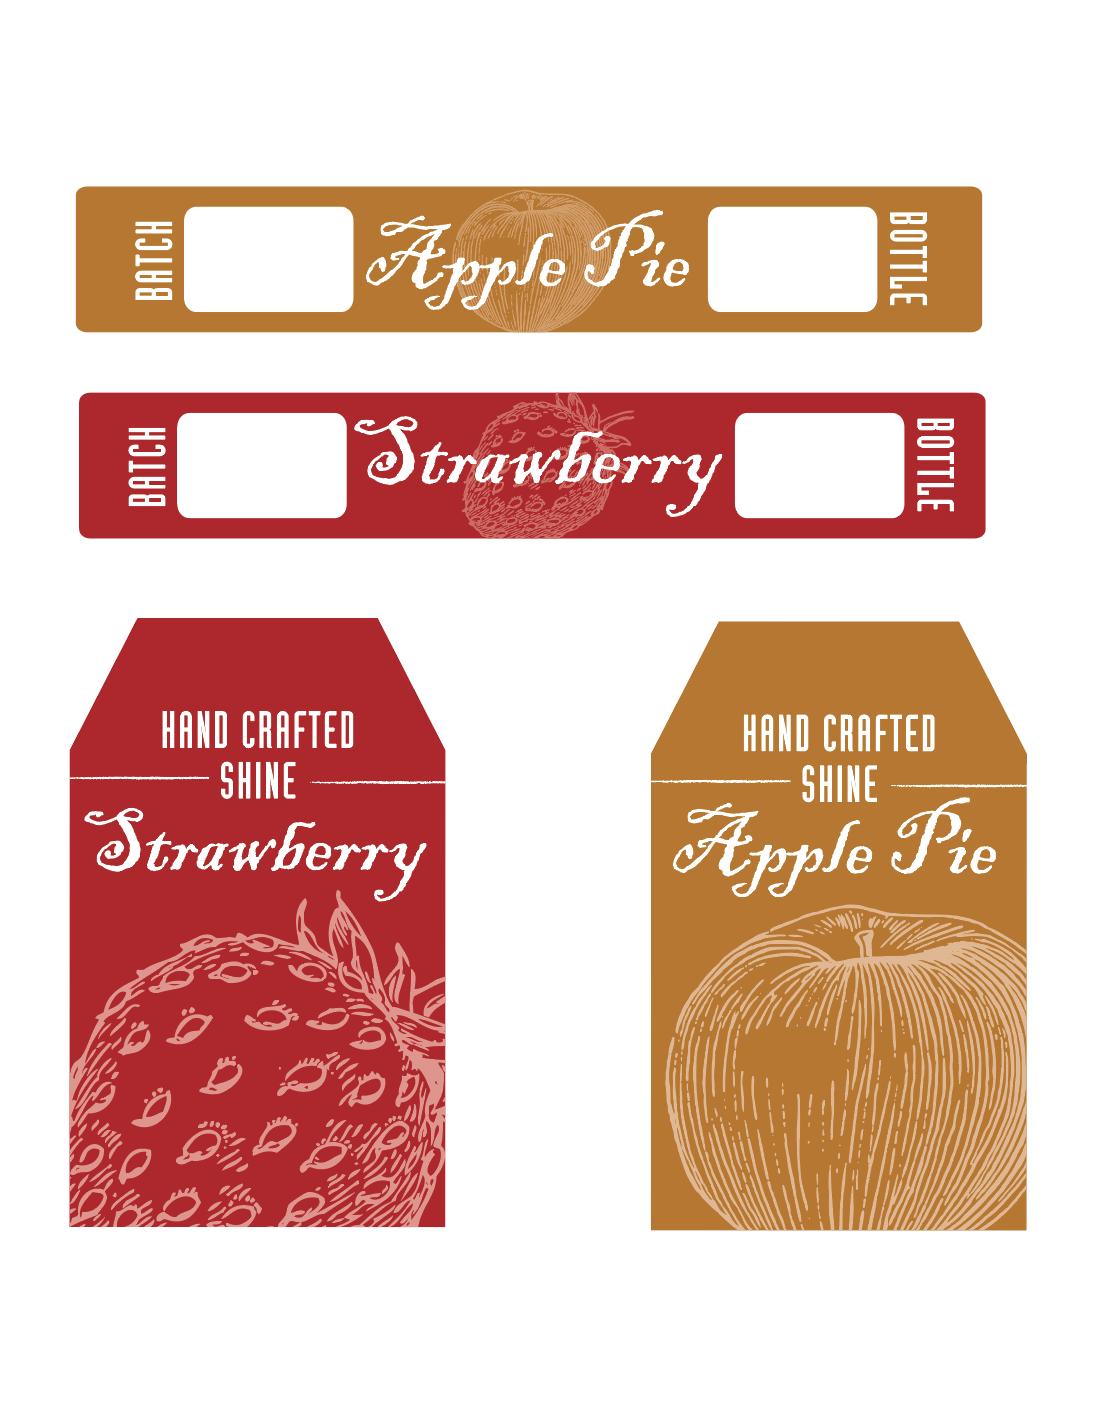 distillery label design by Mike Hosier